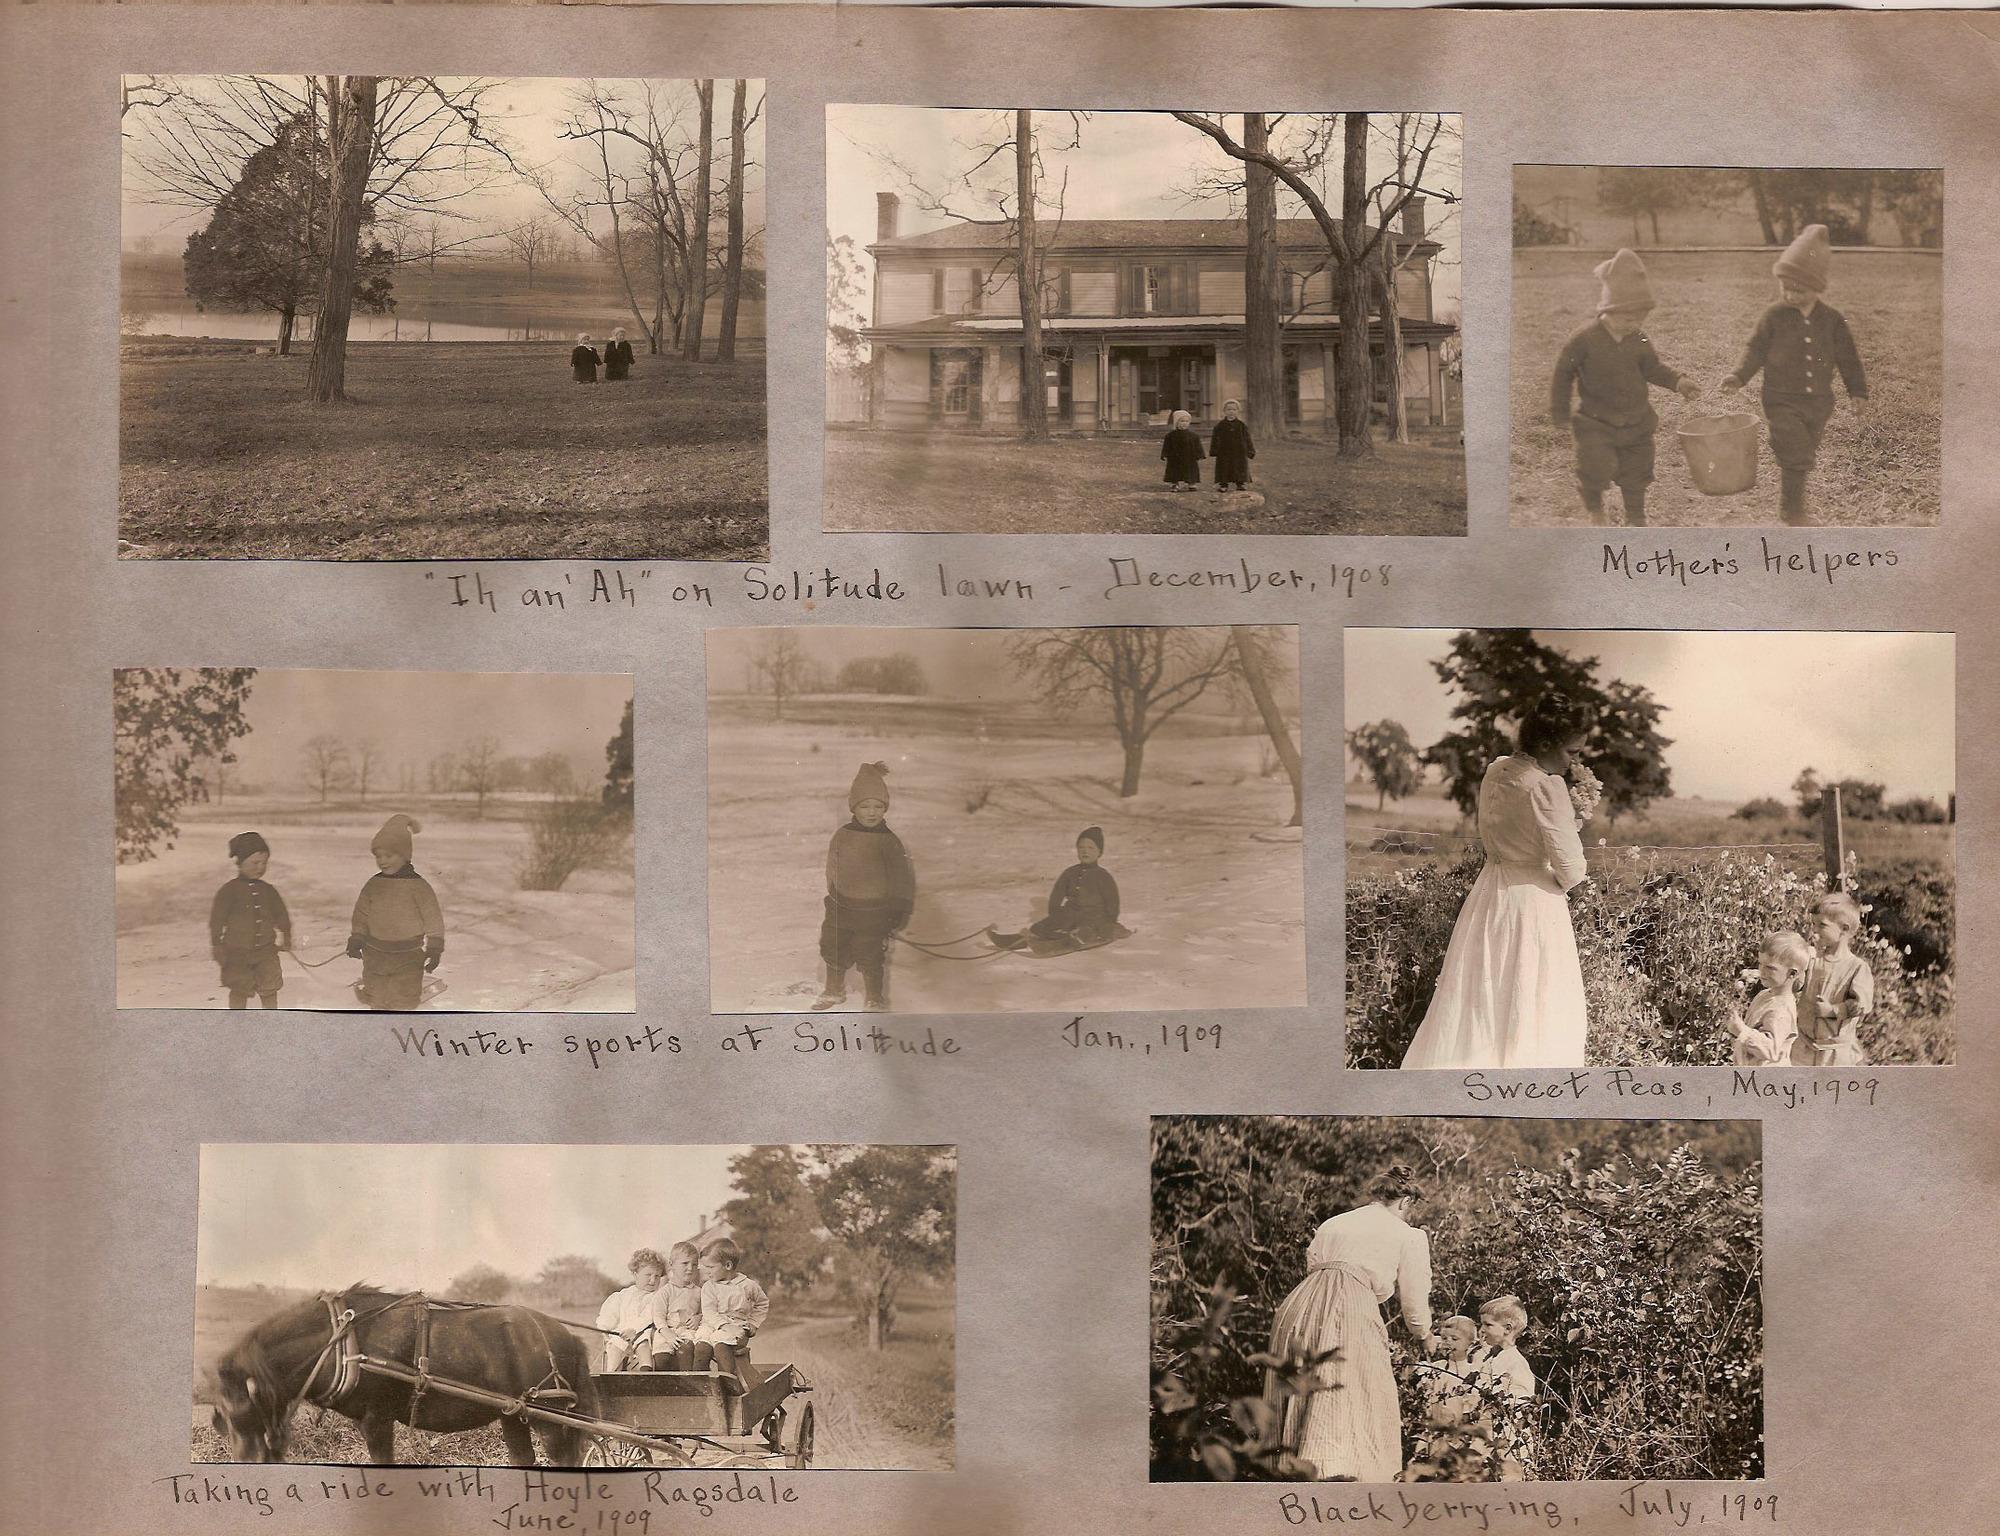 Fletcher_RFletcherPhotos_ScrapbookPage03_1908.jpg